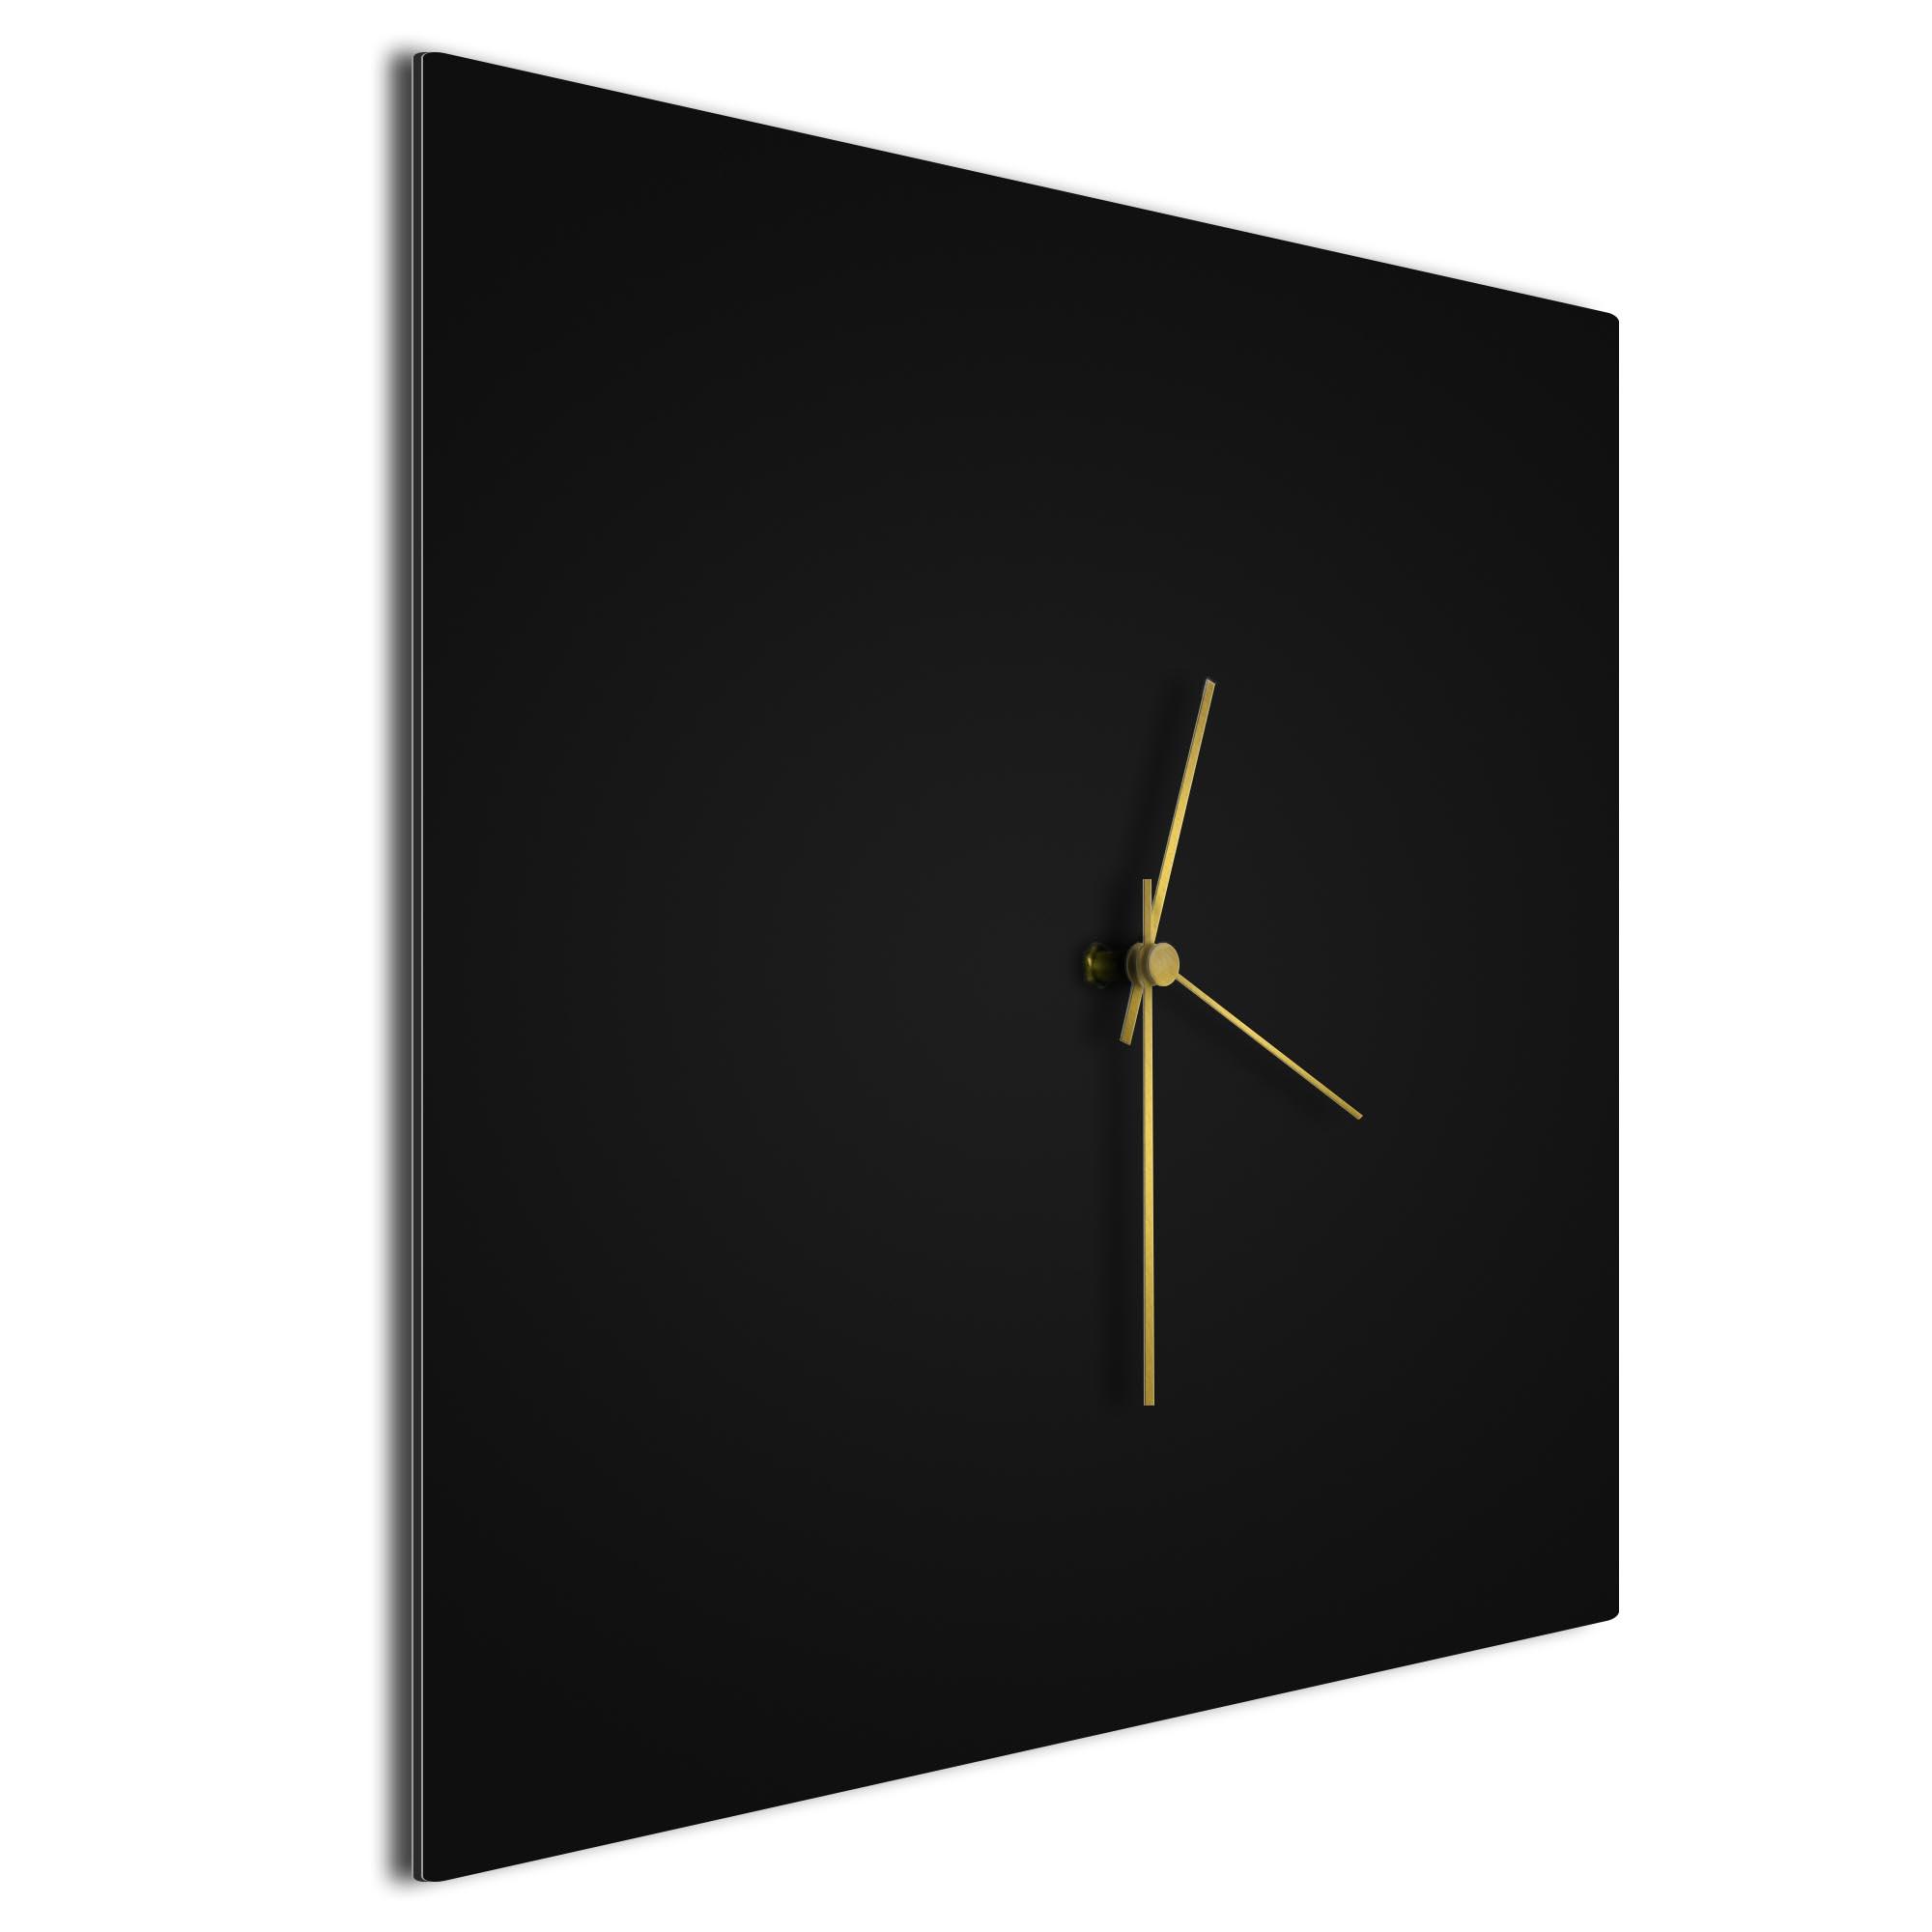 Blackout Gold Square Clock Large - Image 2